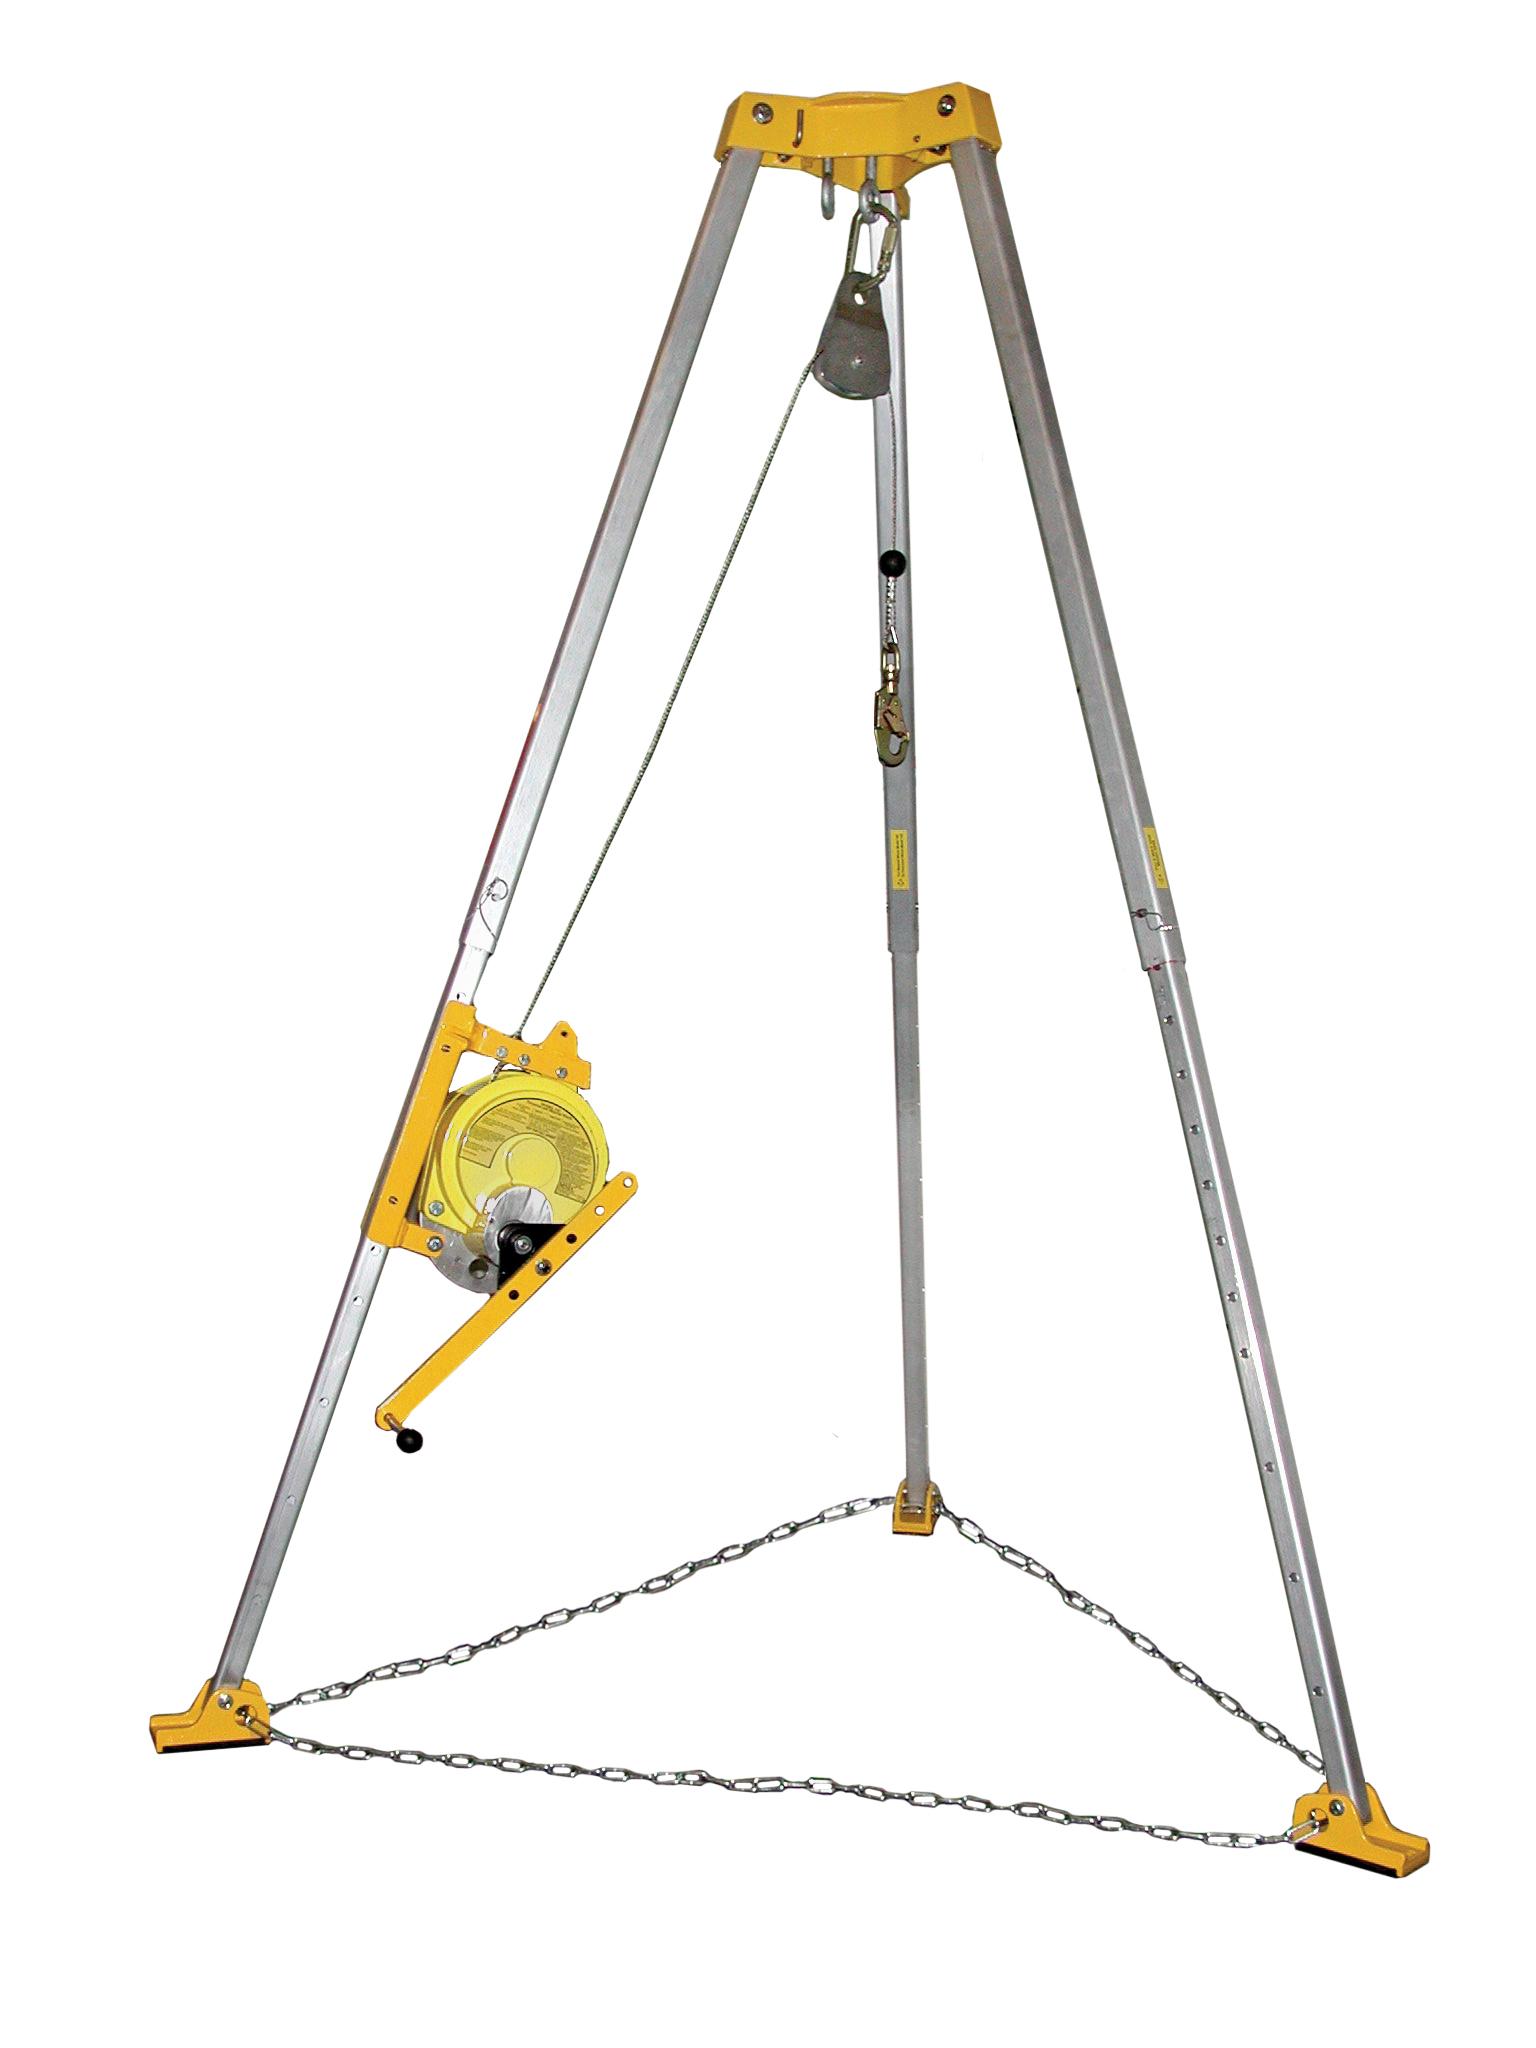 Diamond Tool: Allegro 9510-01 Manhole Saddle Vent